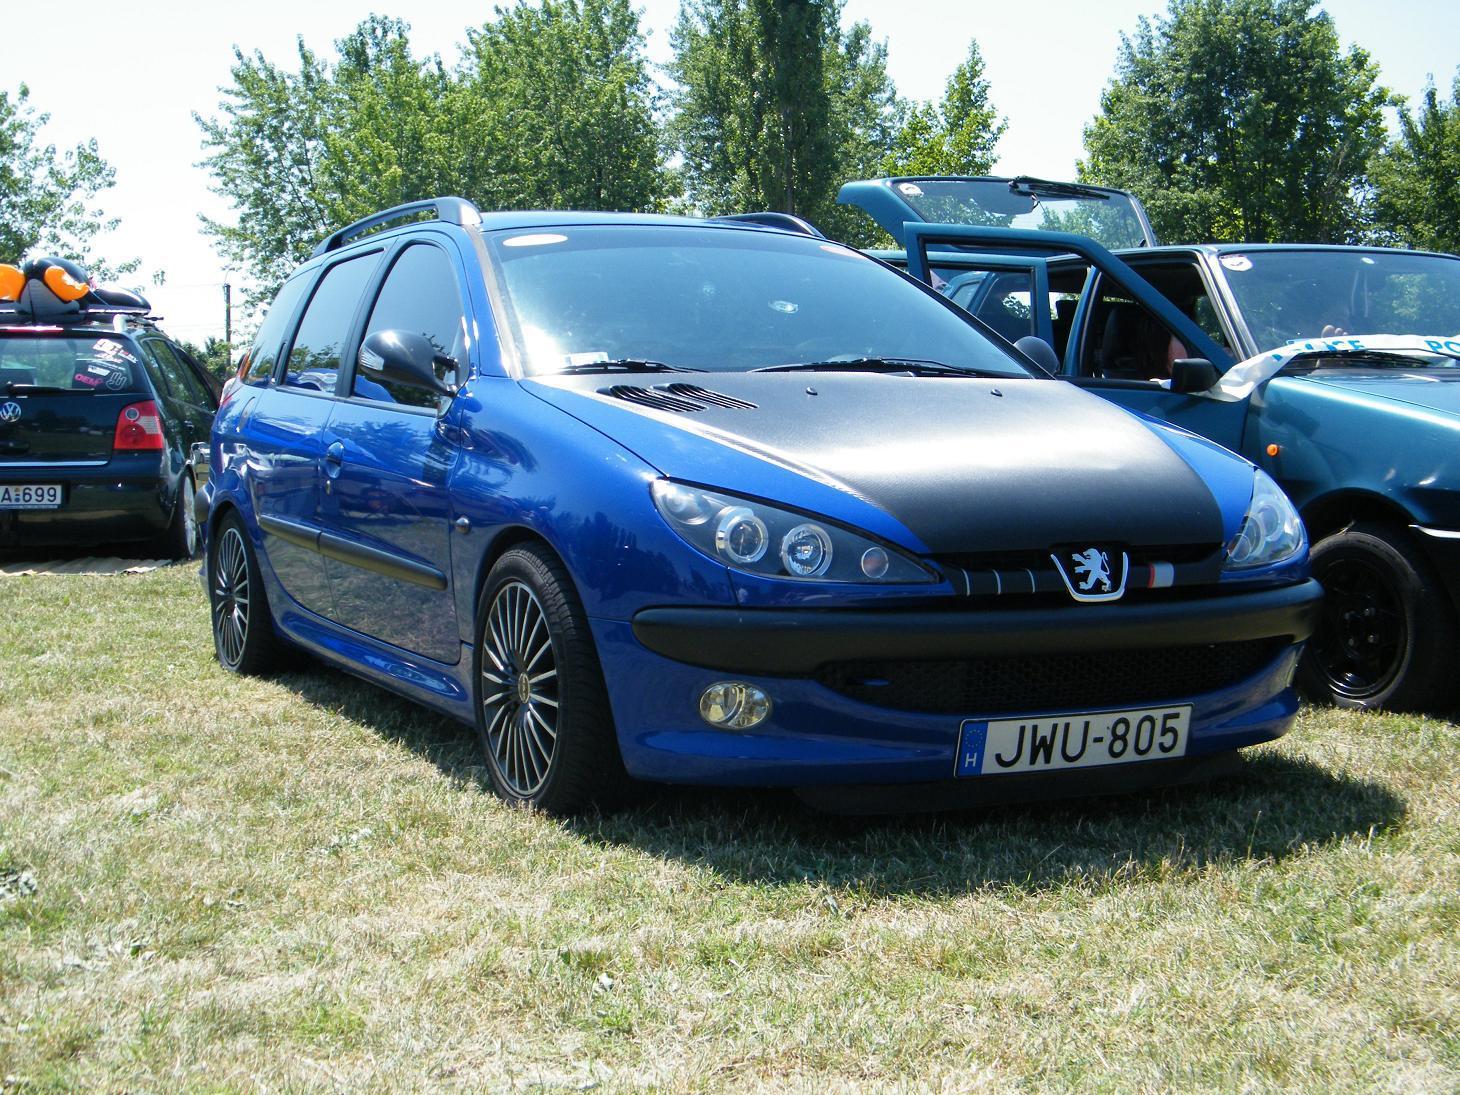 Peugeot 206 Sw Tuning Alig Carstyling Com Magyar Autotuning Portal Es Webaruhaz